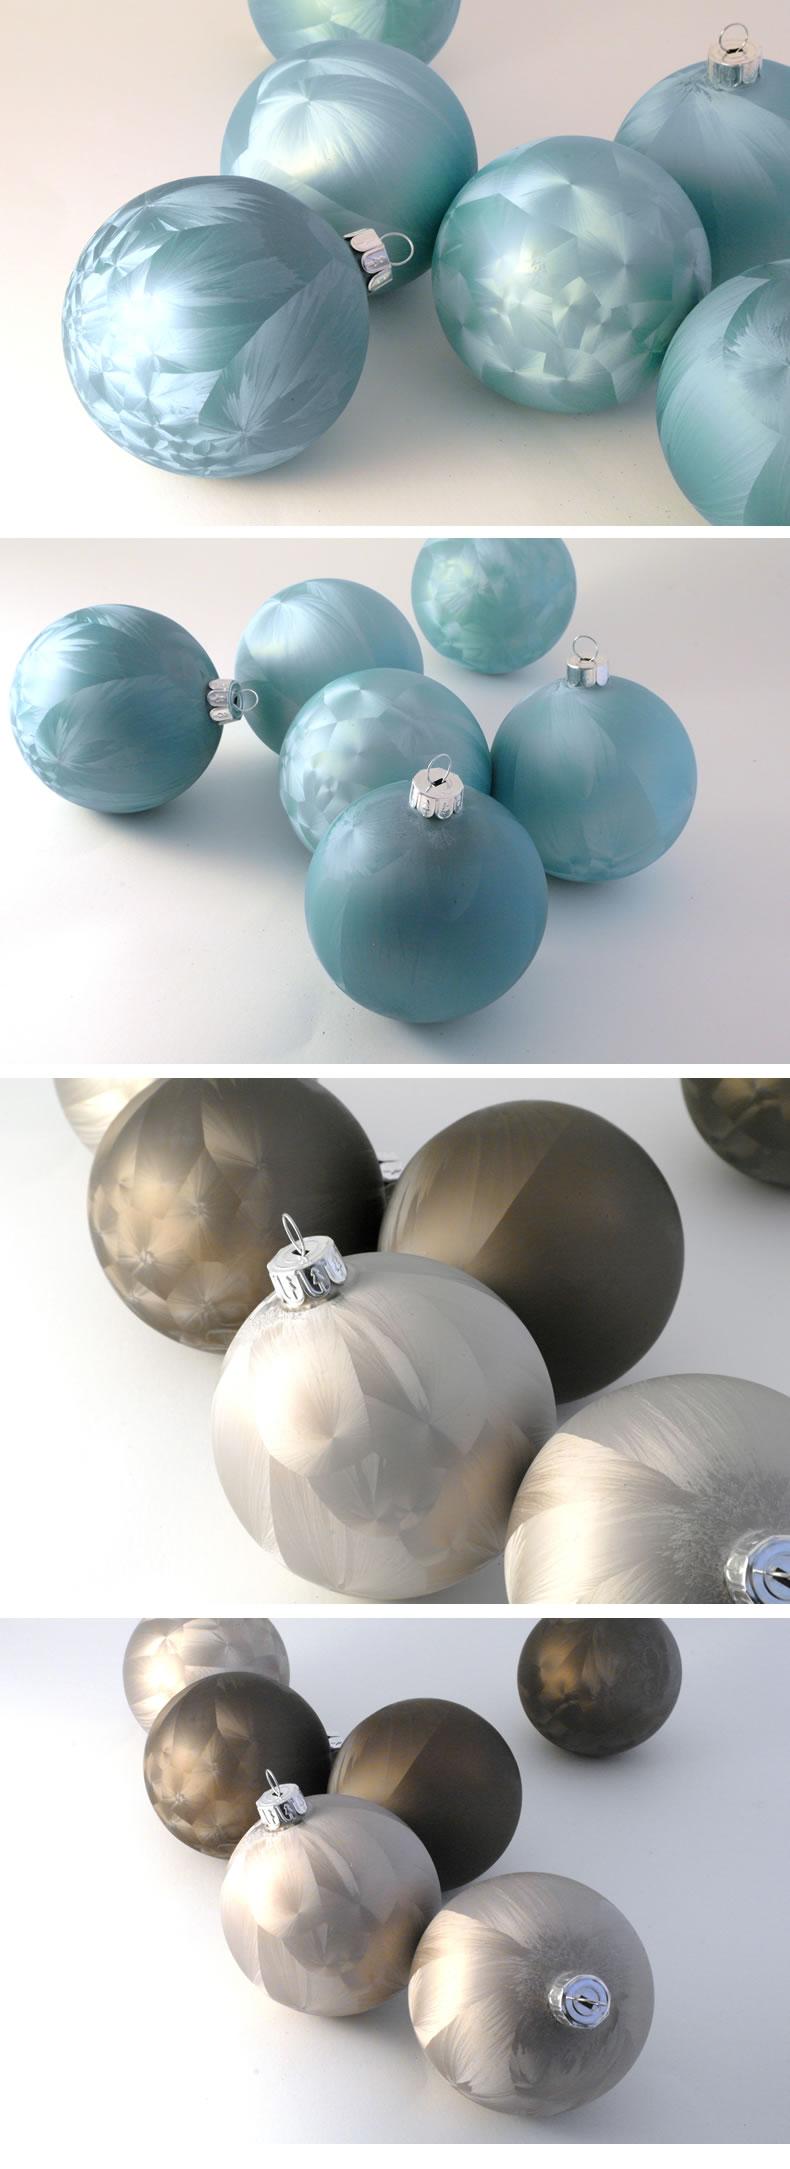 4 xl design weihnachtskugeln christbaumkugeln kugel glas dekokugeln baumschmuck ebay. Black Bedroom Furniture Sets. Home Design Ideas